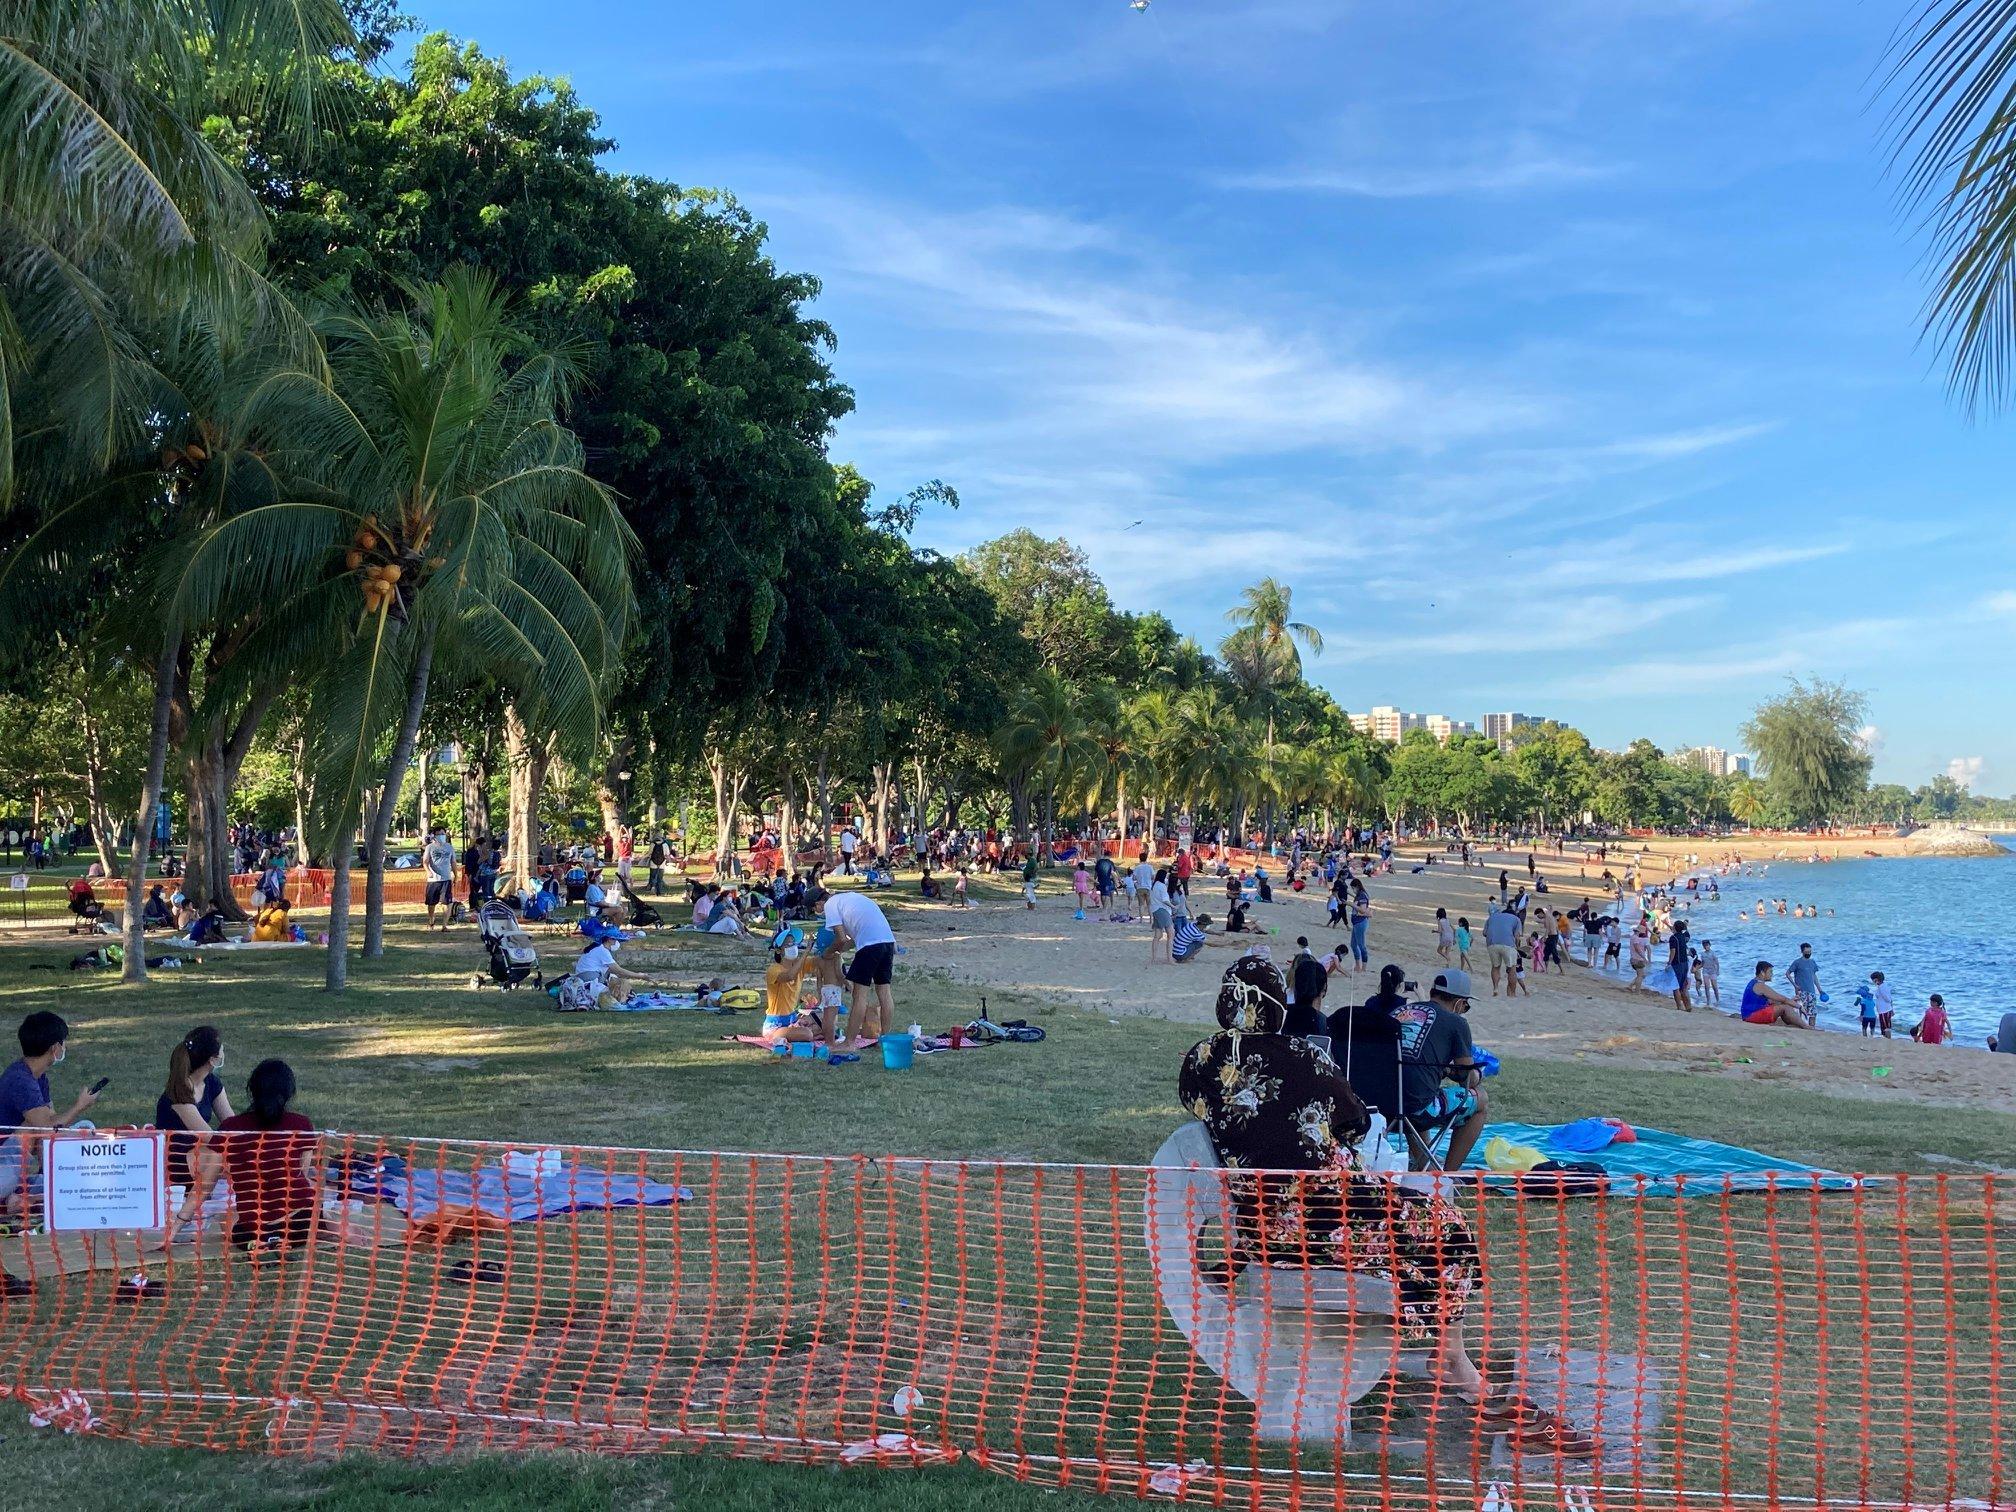 Pitching of Tents - FishingKaki.com |East Coast Park Shelter